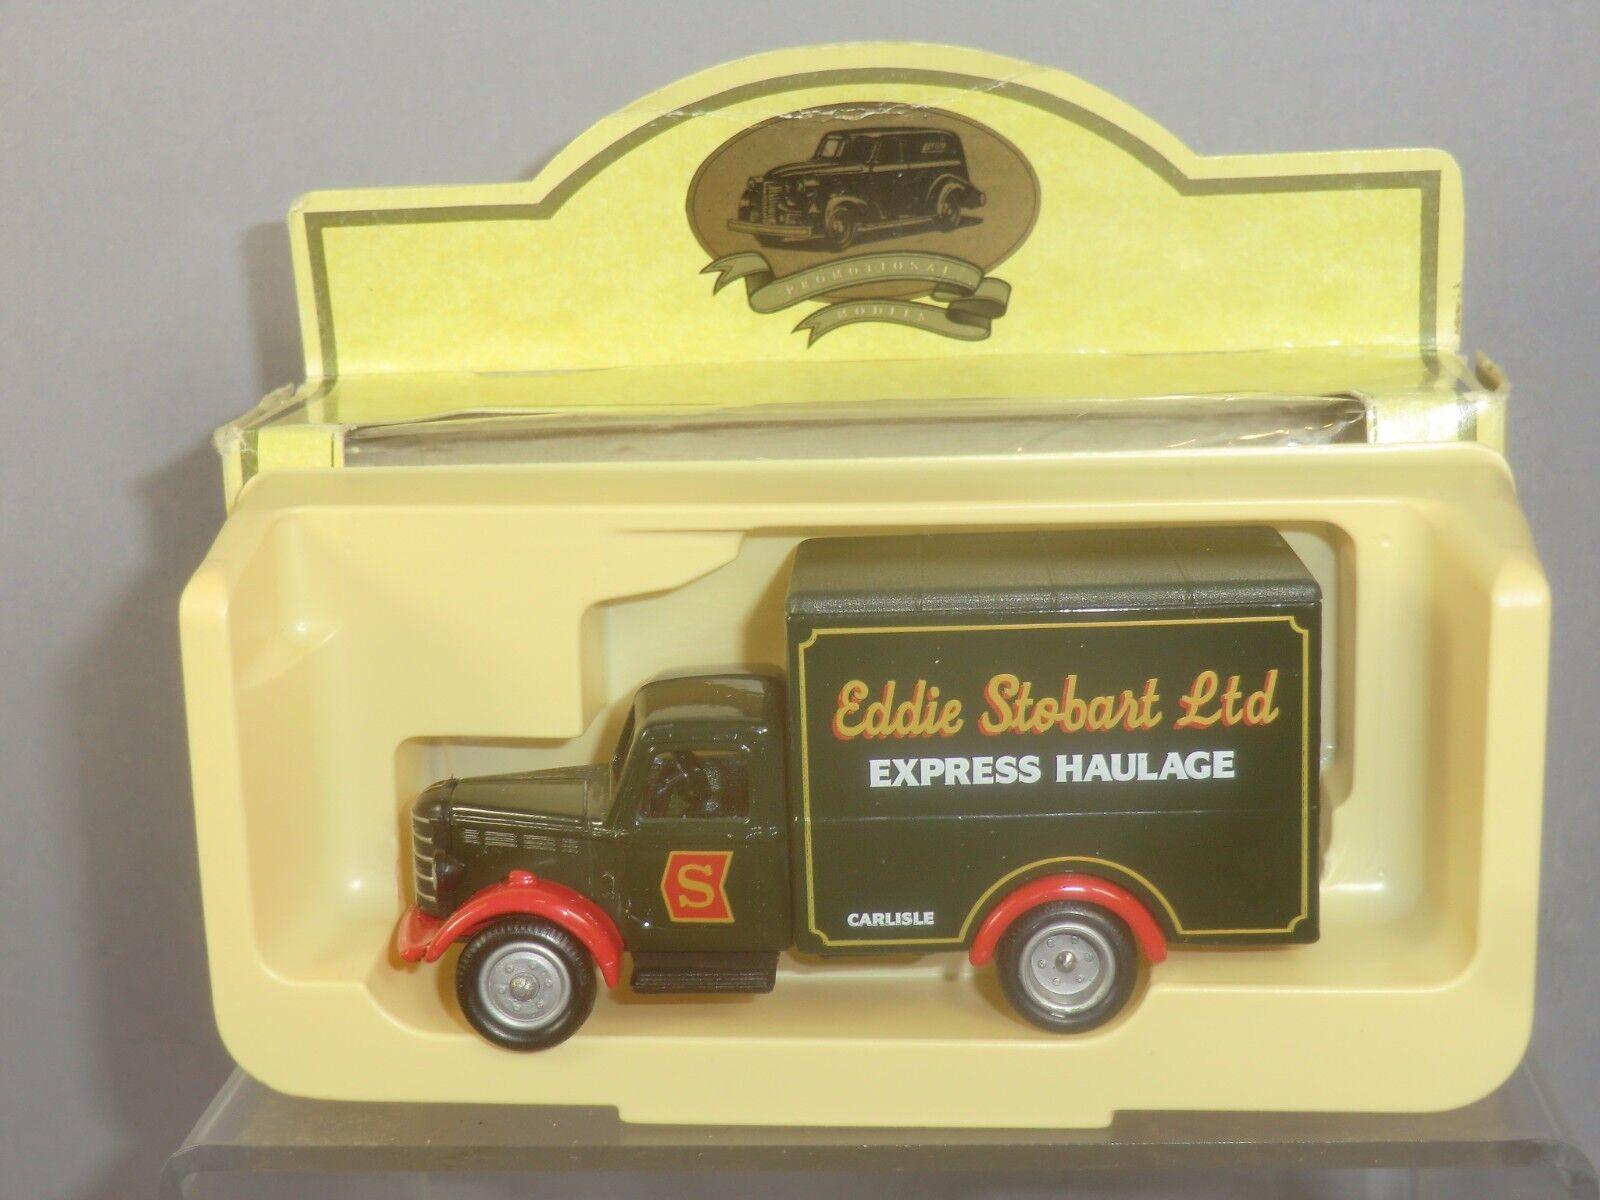 Lledo Promocional Modelo No.LP59 Bedford 30CWT Eddie Stobart Ltd Ed. MIB